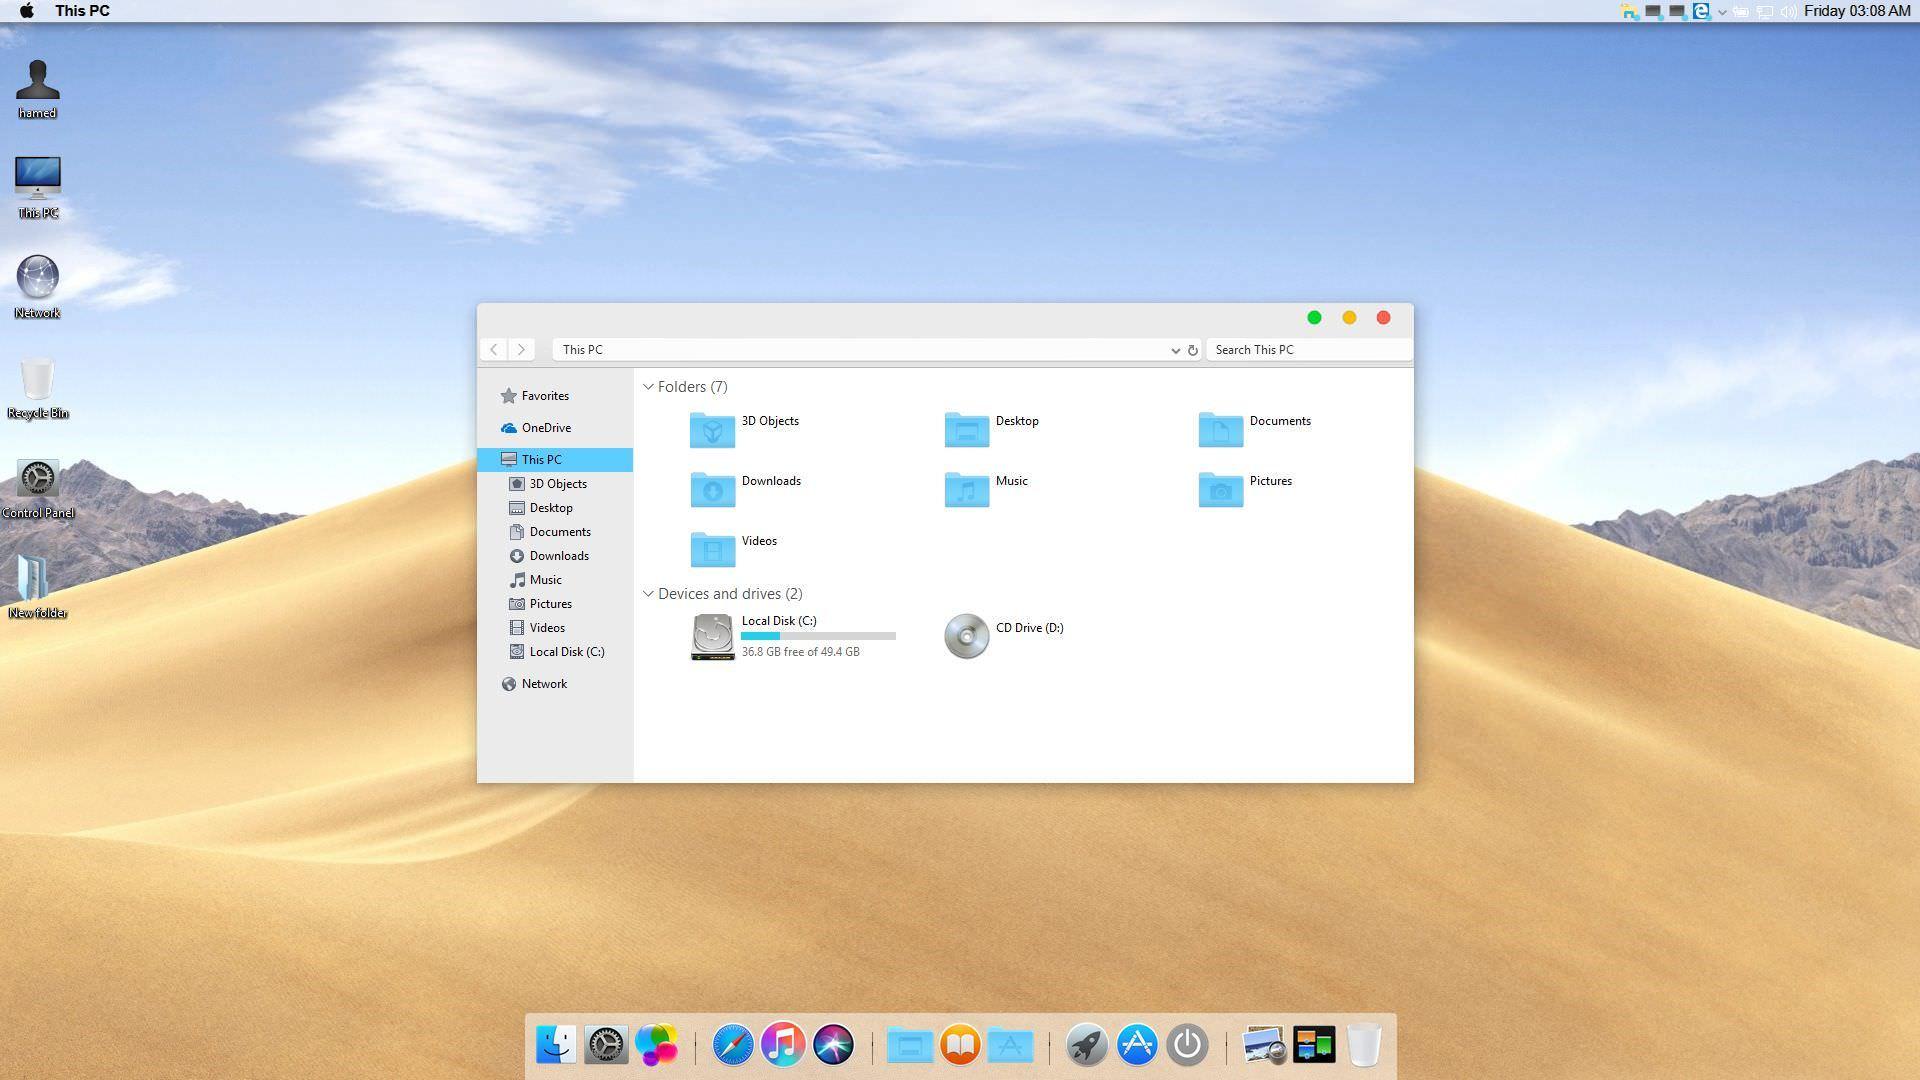 10 Free Windows Skins Themes Minimalist And Apple Macos Style